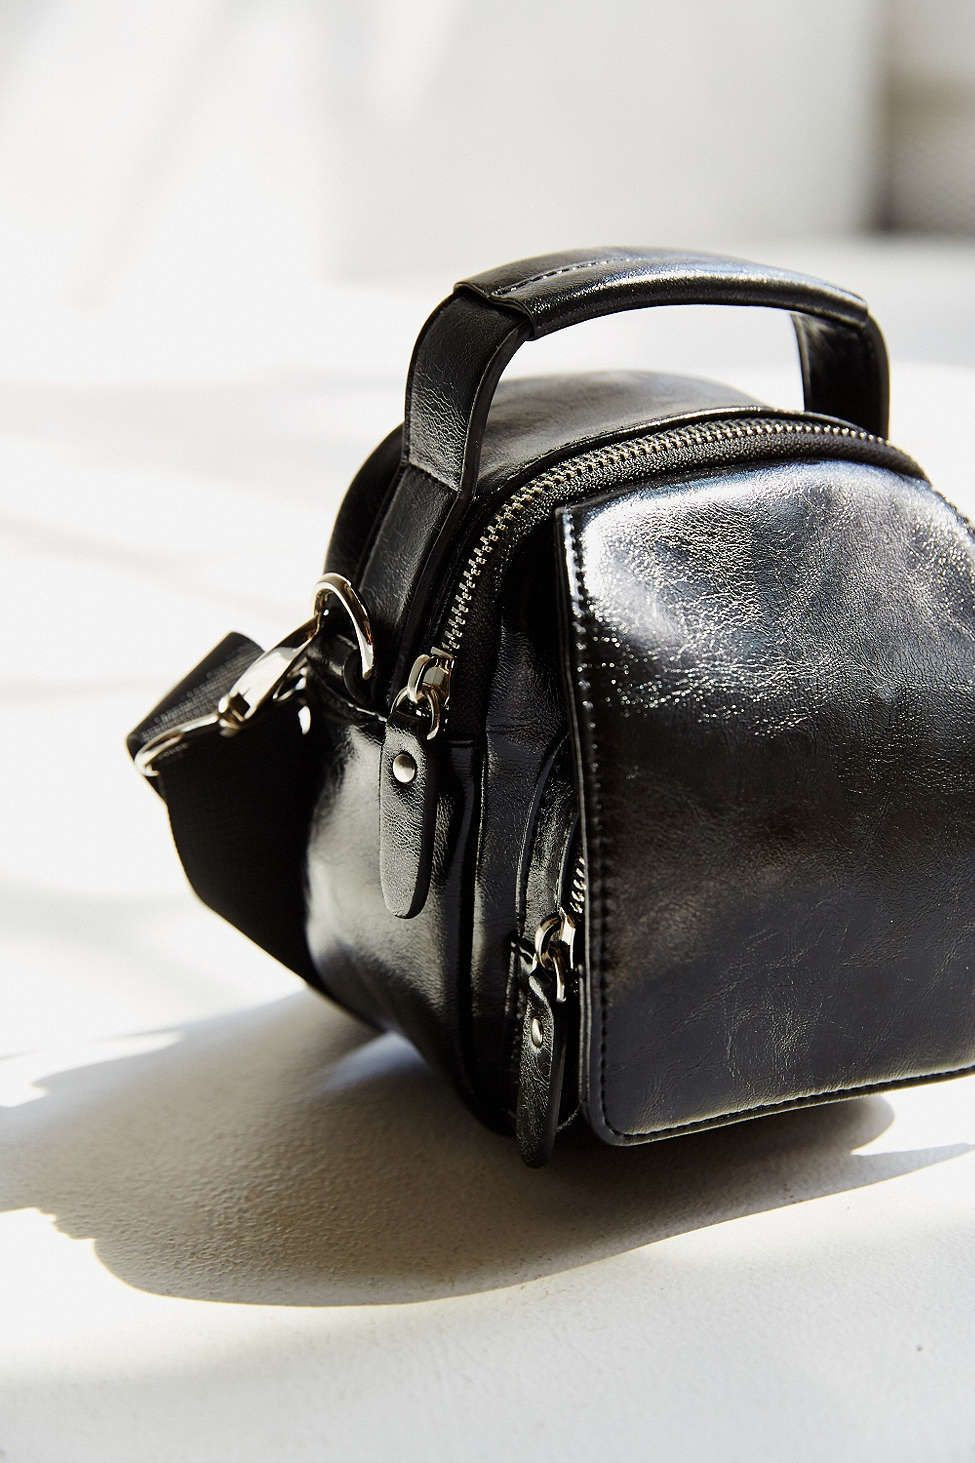 Cooperative Mini Camera Bag Urban Outfitters Canta Canta Modelleri